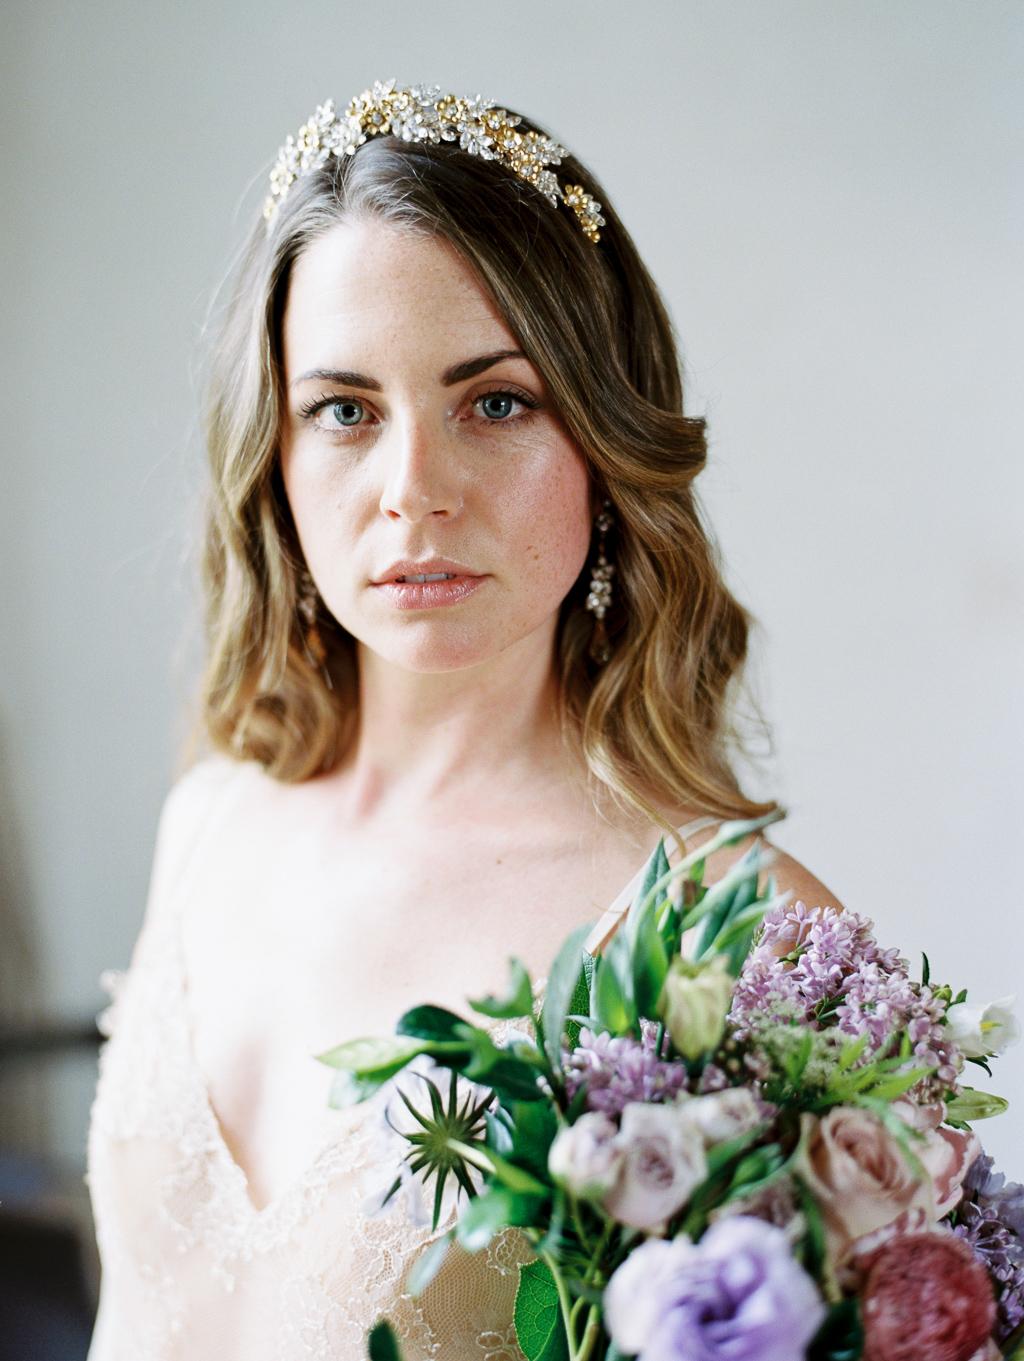 washington-dc-makeup-artist-sue-minskey-beauty